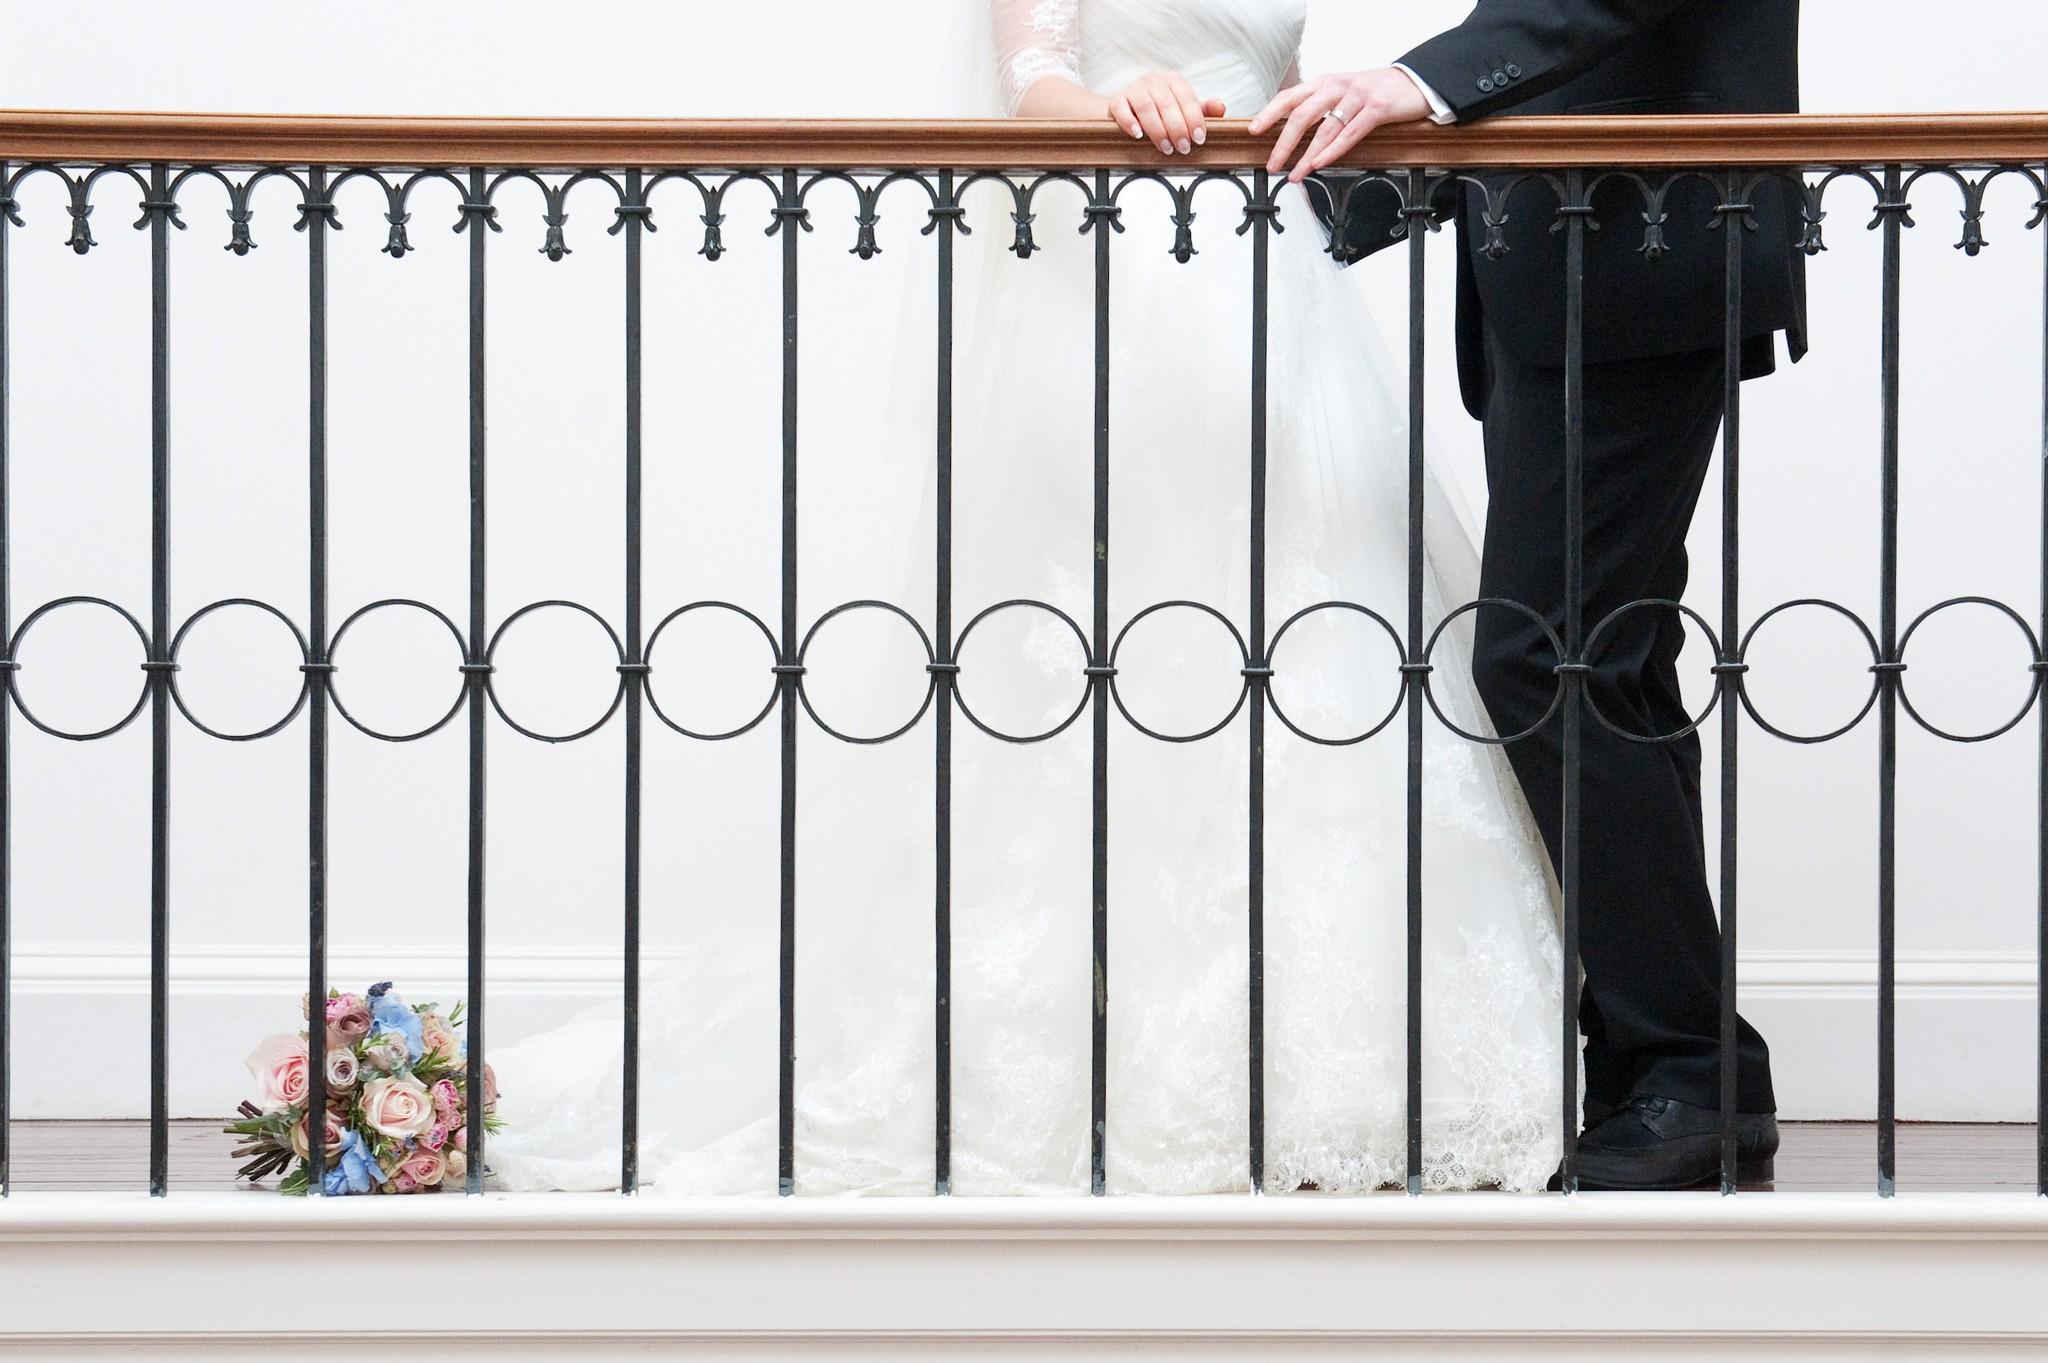 Balcony Bride and Groom - By Jackie Photography - www.byjackie.co.uk - @babies_by_jackie